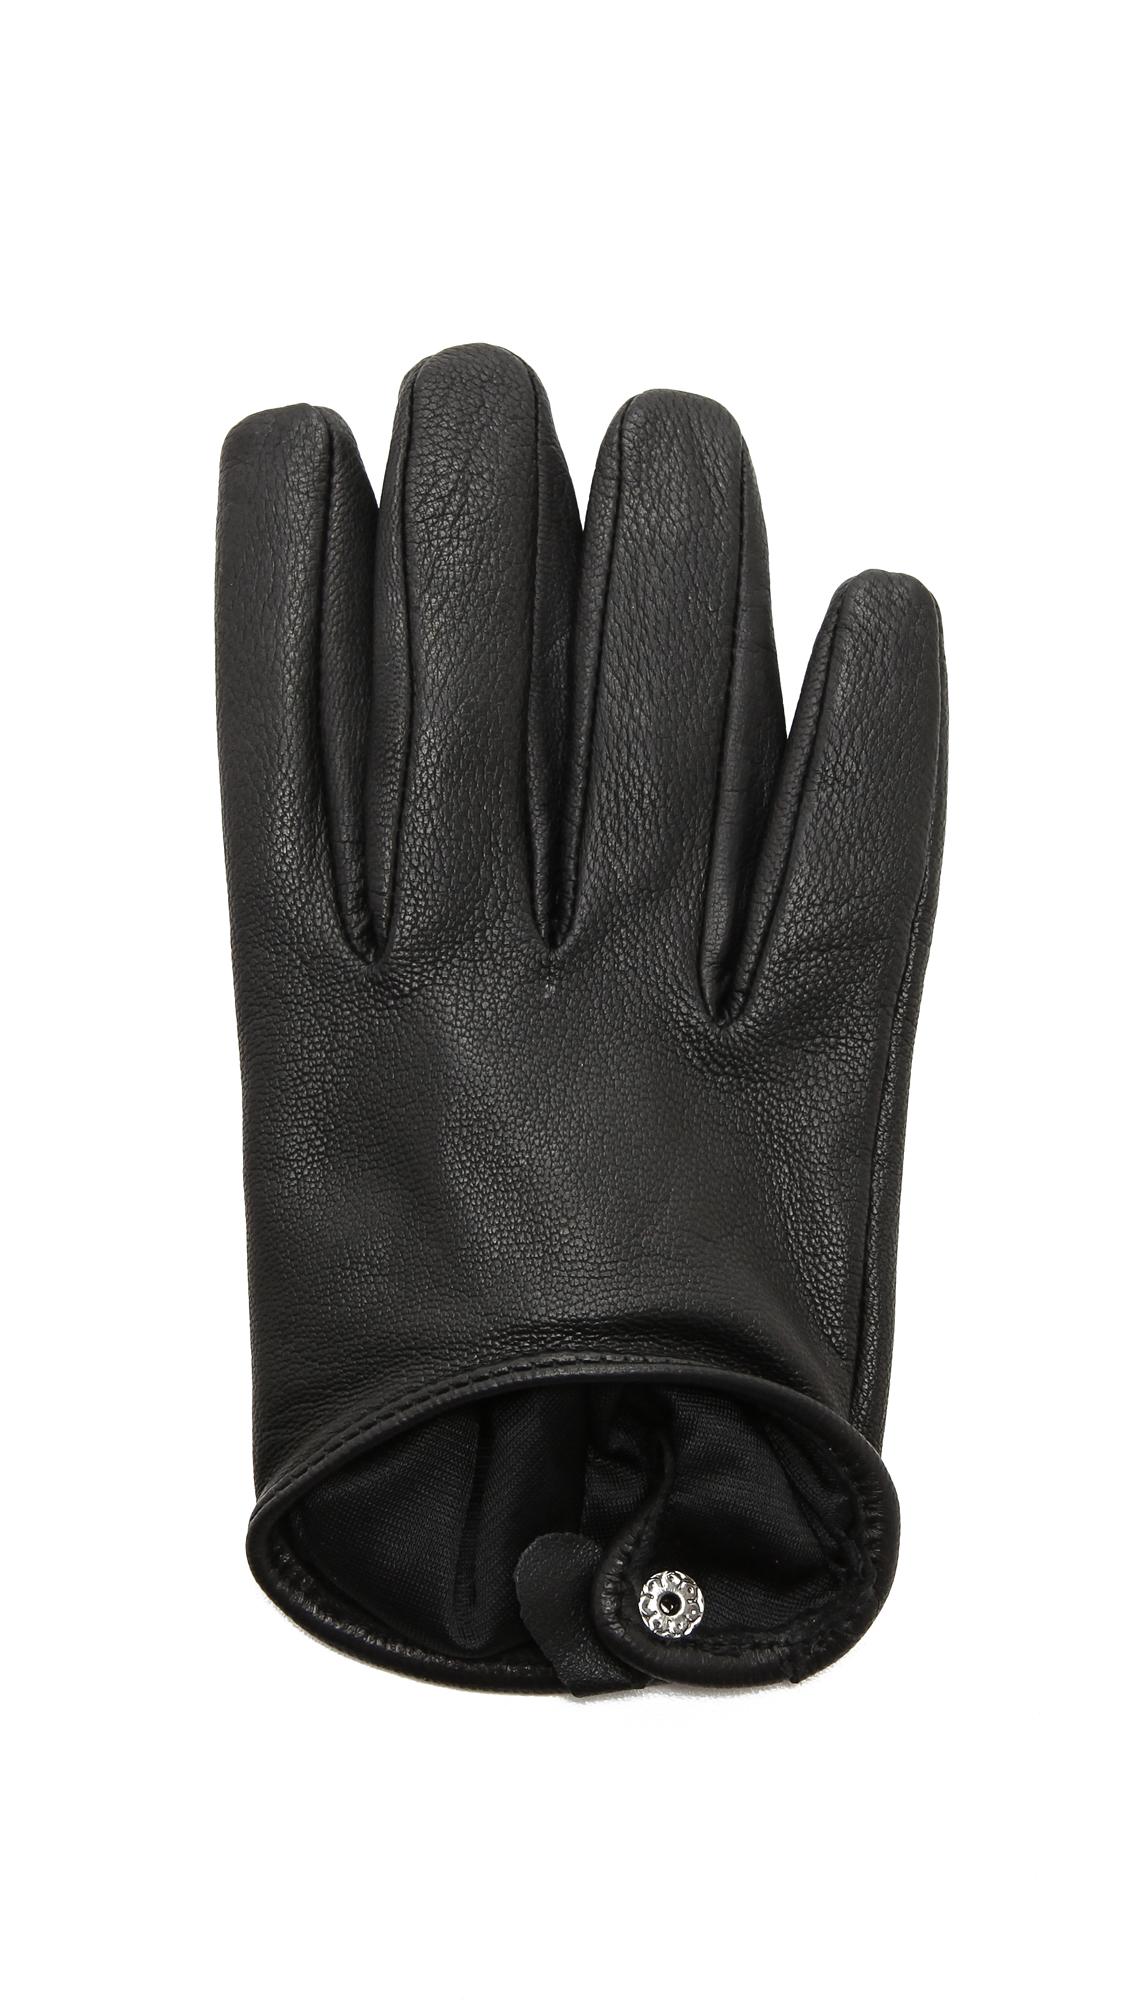 Carolina Amato Short Leather Gloves Shopbop Save Up To 25 Use Glove Code More18